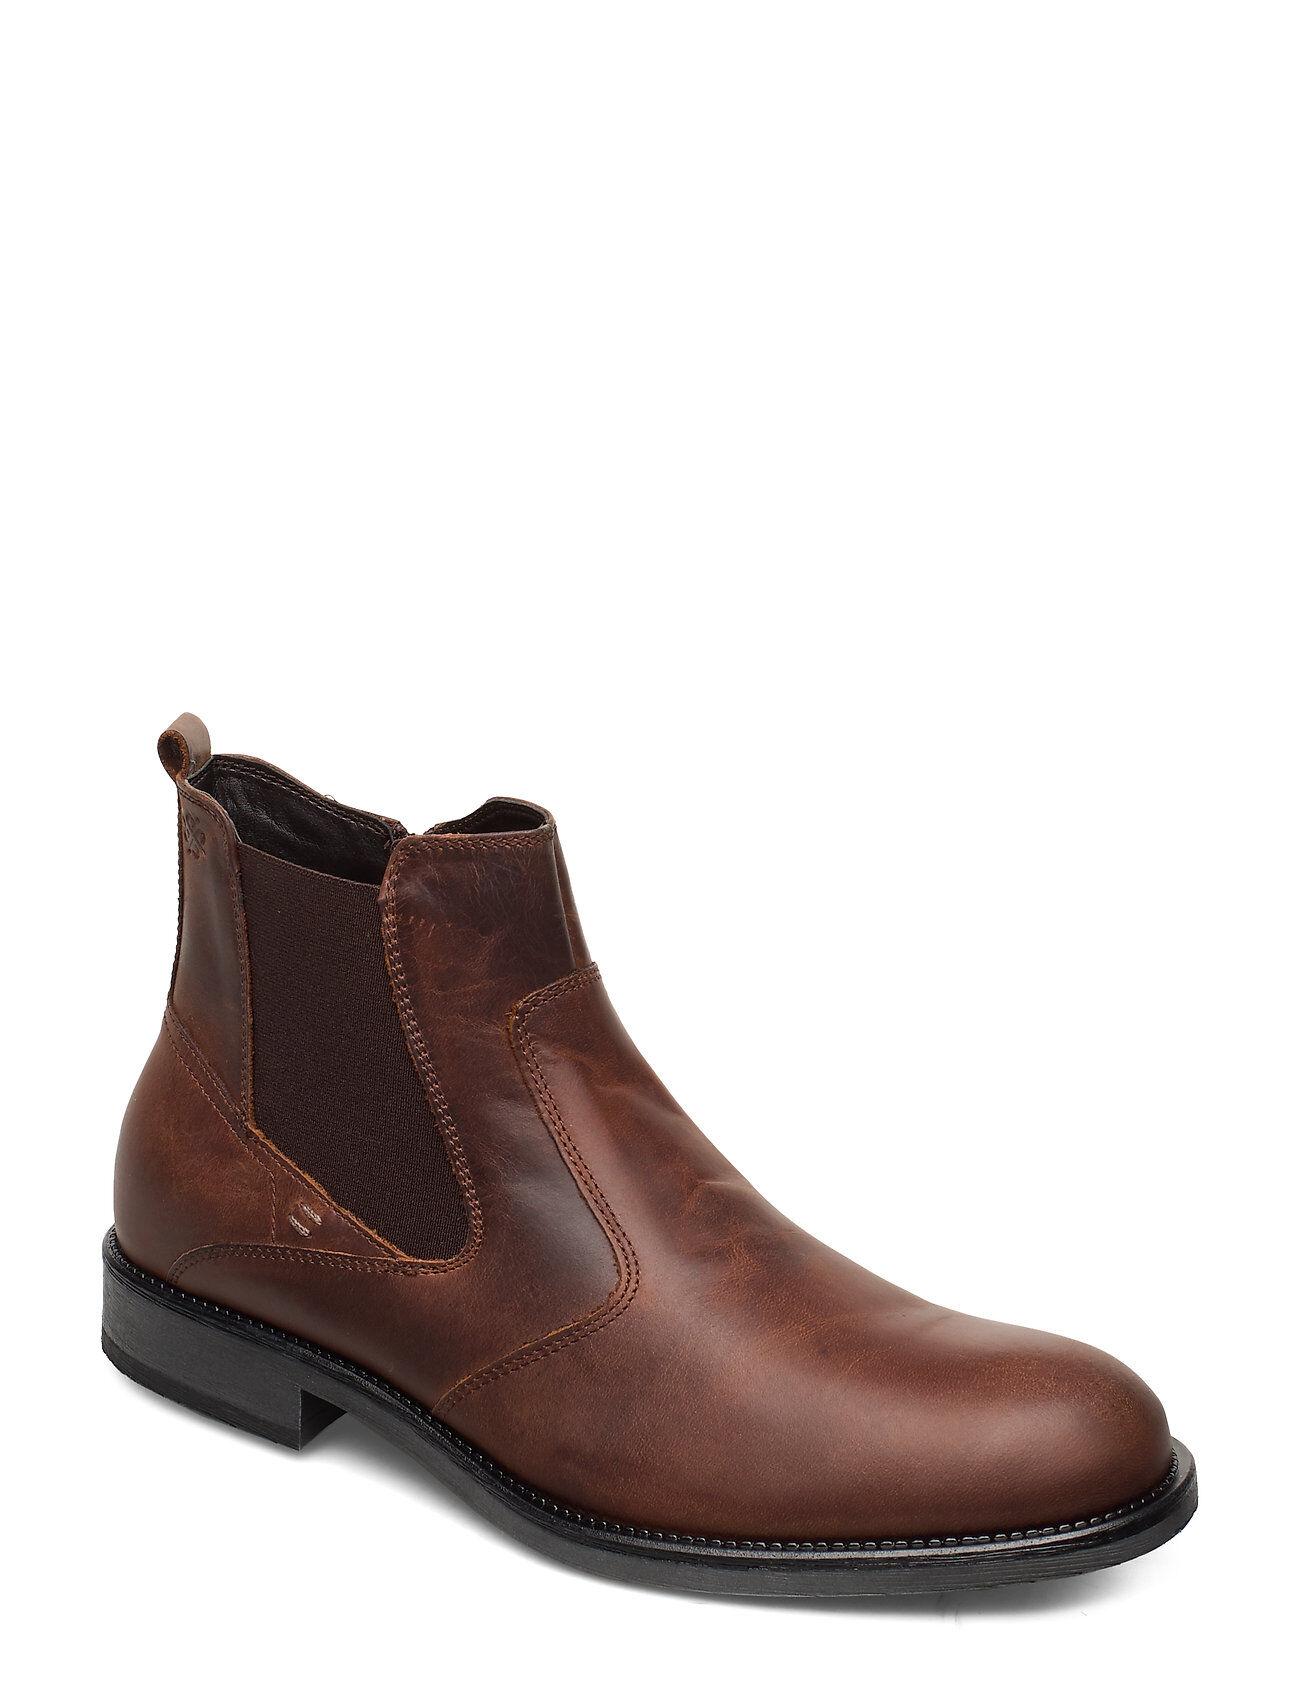 Playboy Footwear 7751 Shoes Chelsea Boots Ruskea Playboy Footwear